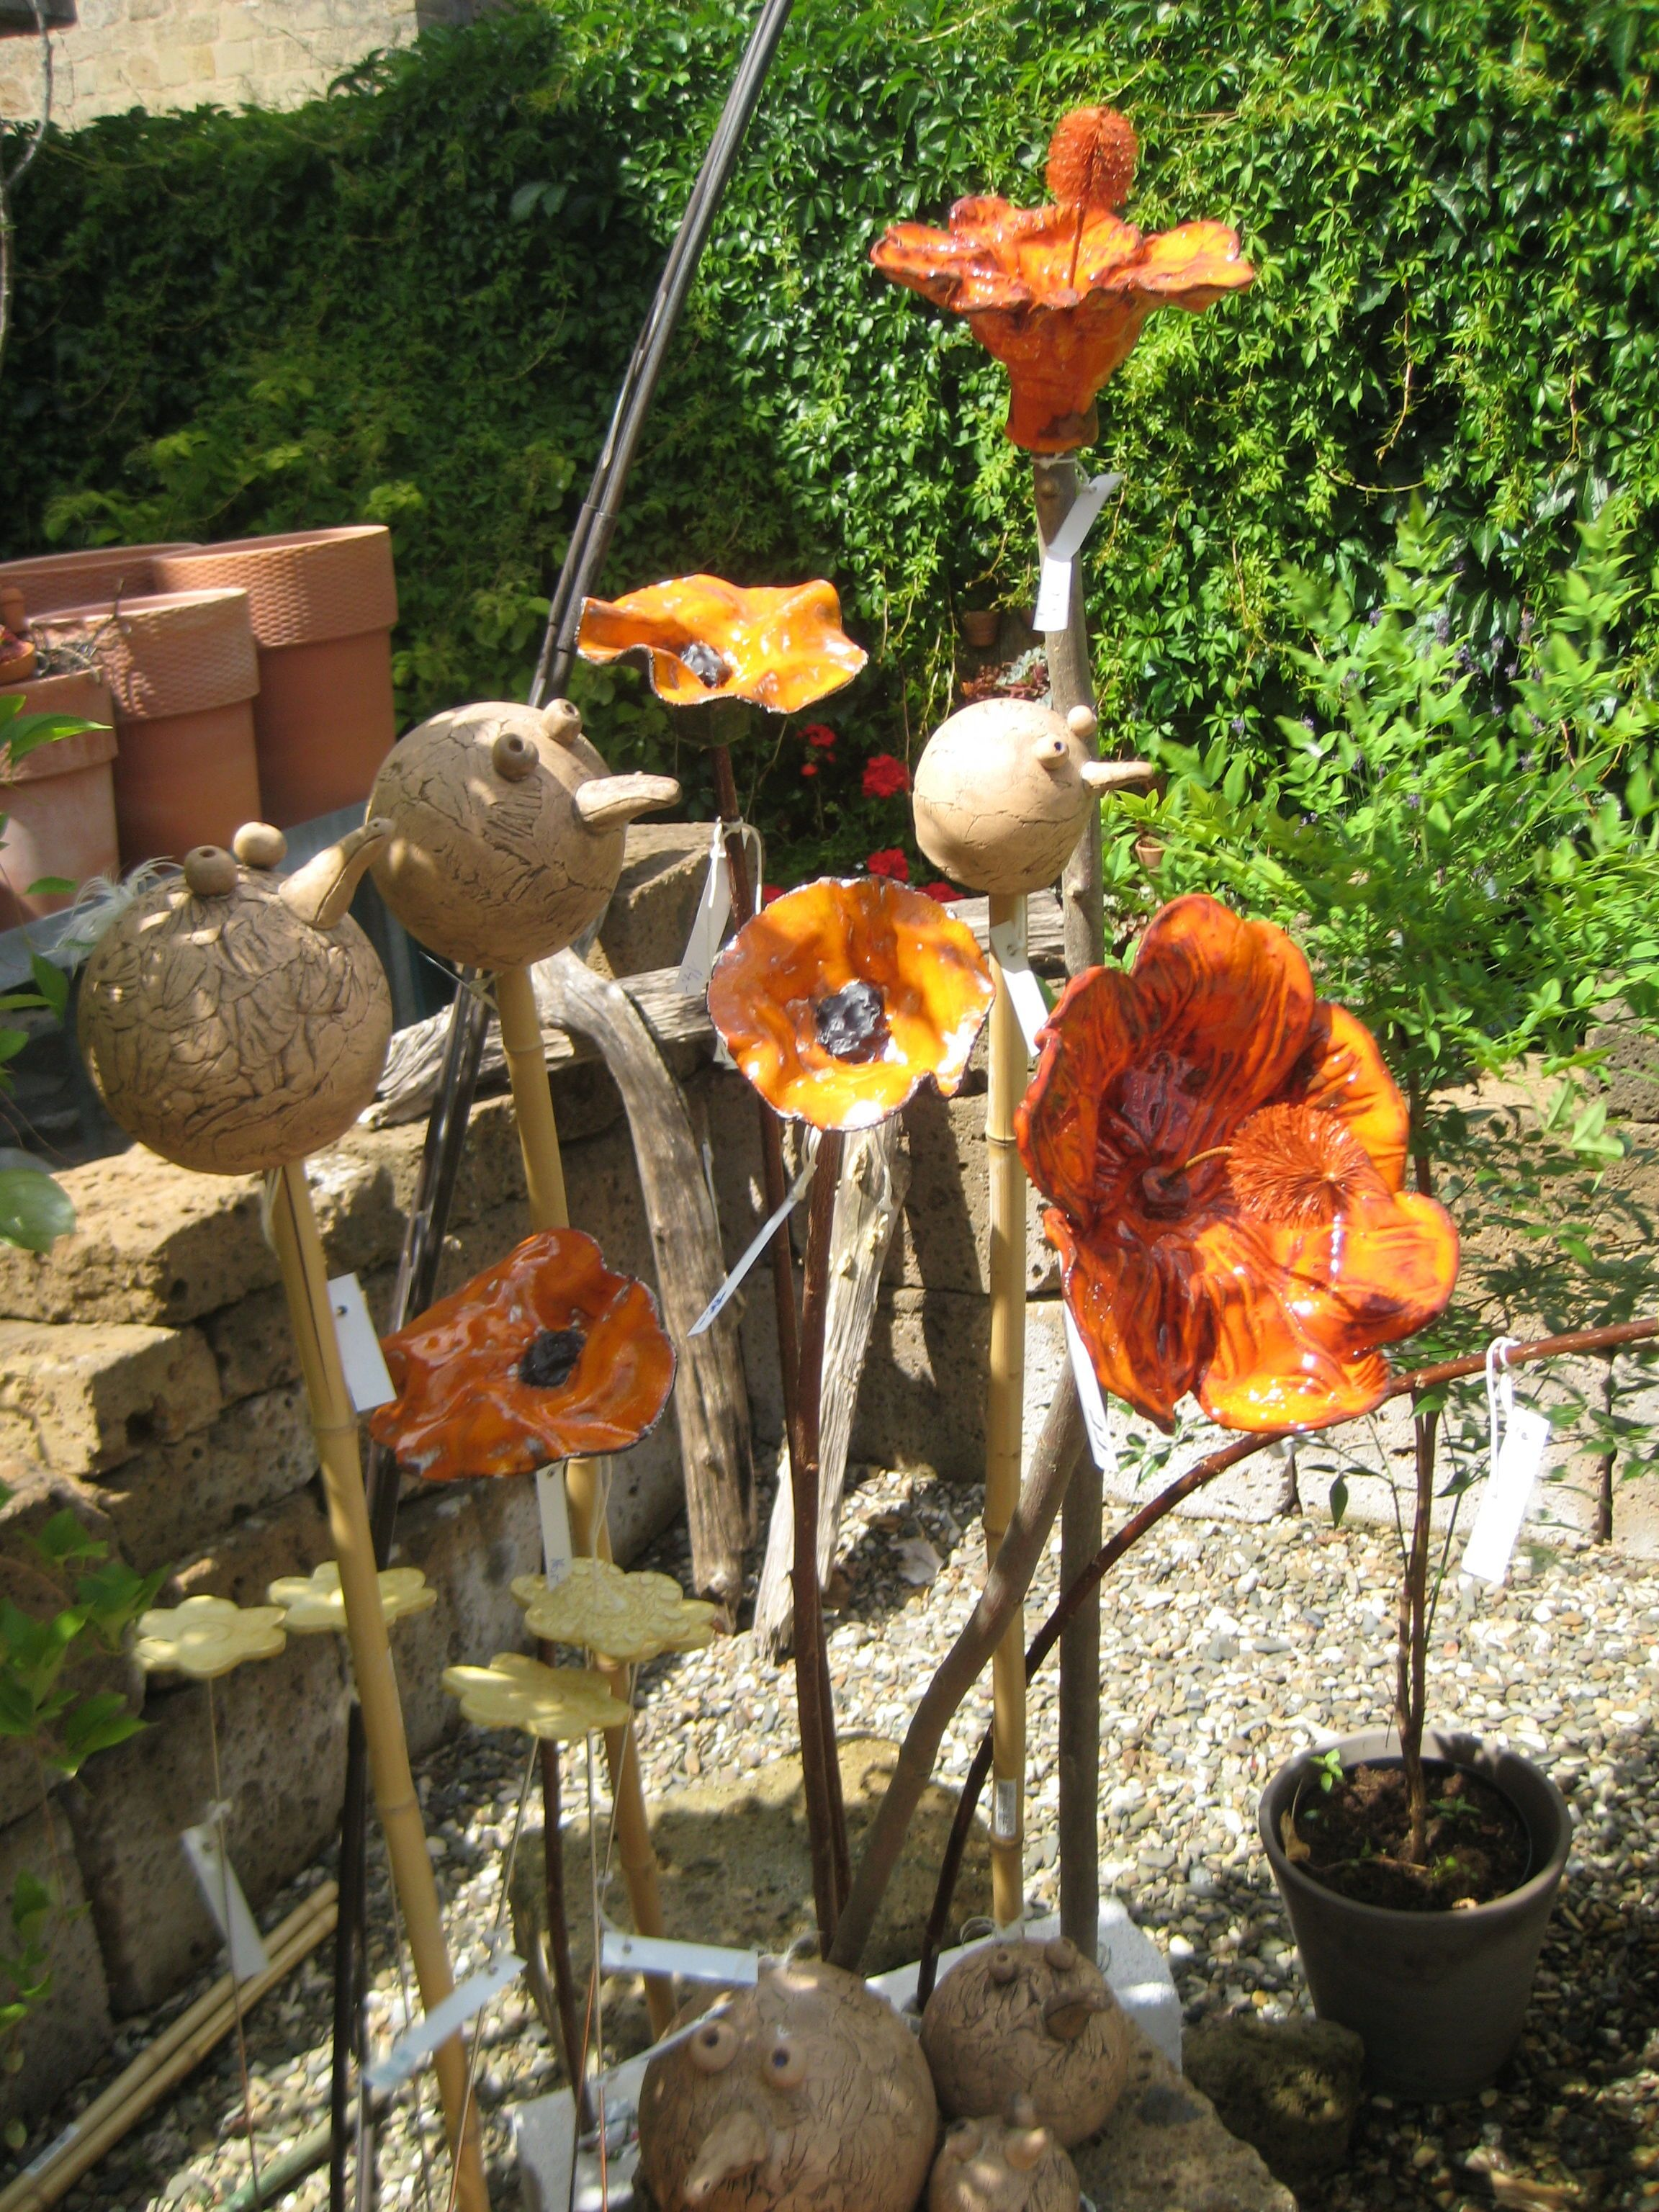 Keramik Hobby Kreativ Bildergalerie Keramik Blumen Bluten Hibiskus Mohnblume Kleine Bluten Kopfe Mit Langer Nase Potter F Bildergalerie Keramik Blumen Bilder